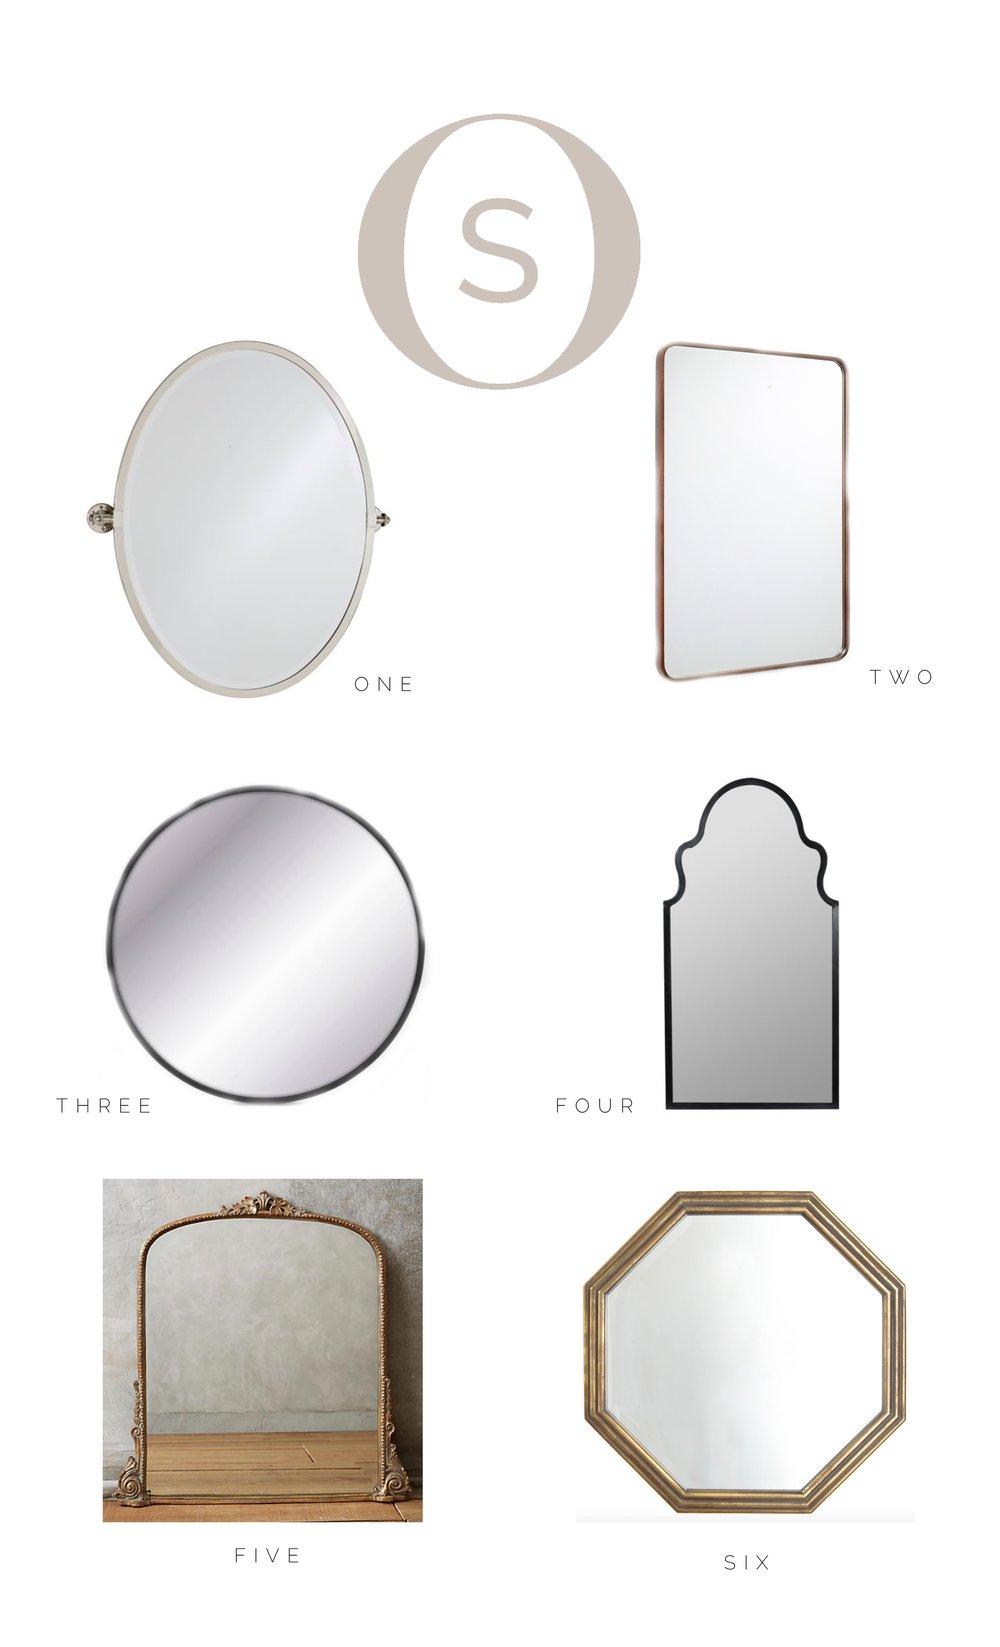 Vanity mirror round up for bathroom